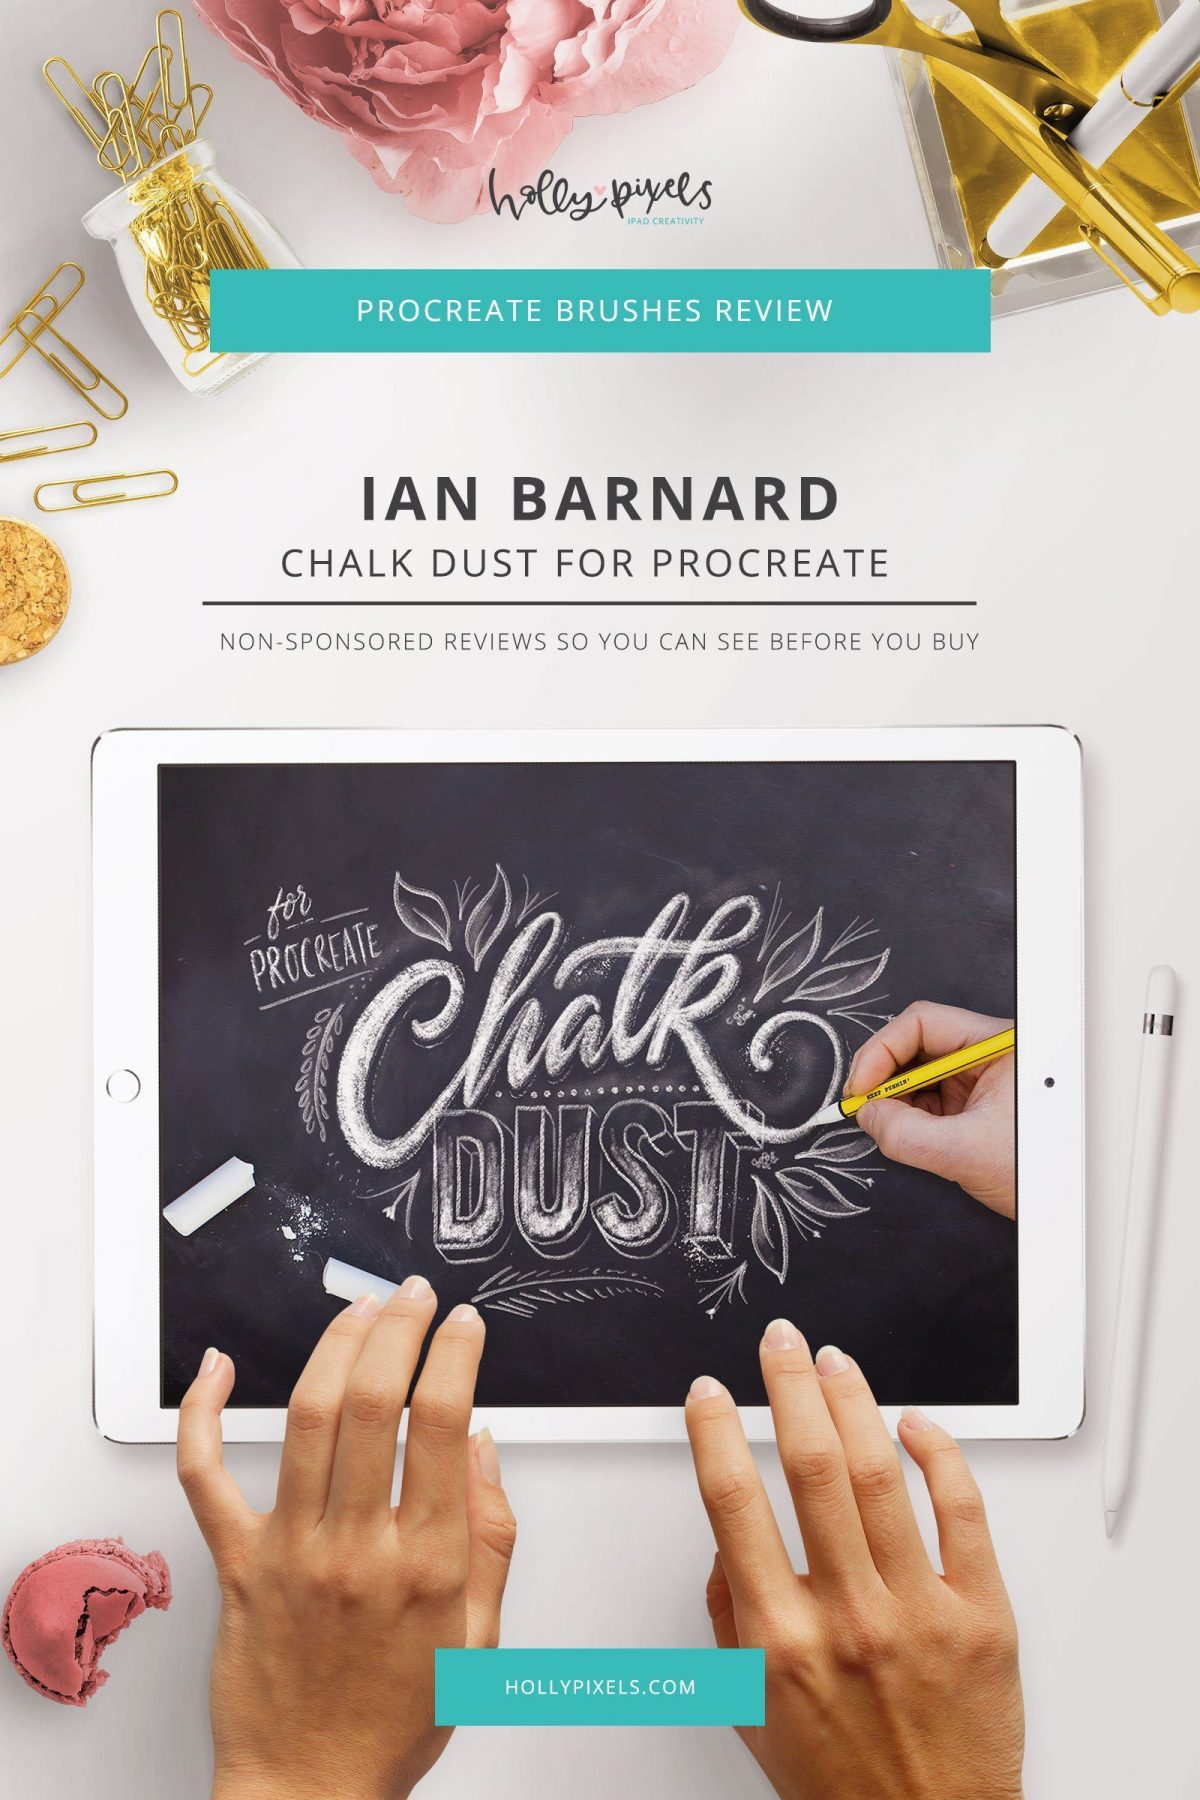 Chalk Dust Procreate Lettering by Ian Barnard | Procreate Brush Review Tuesdays